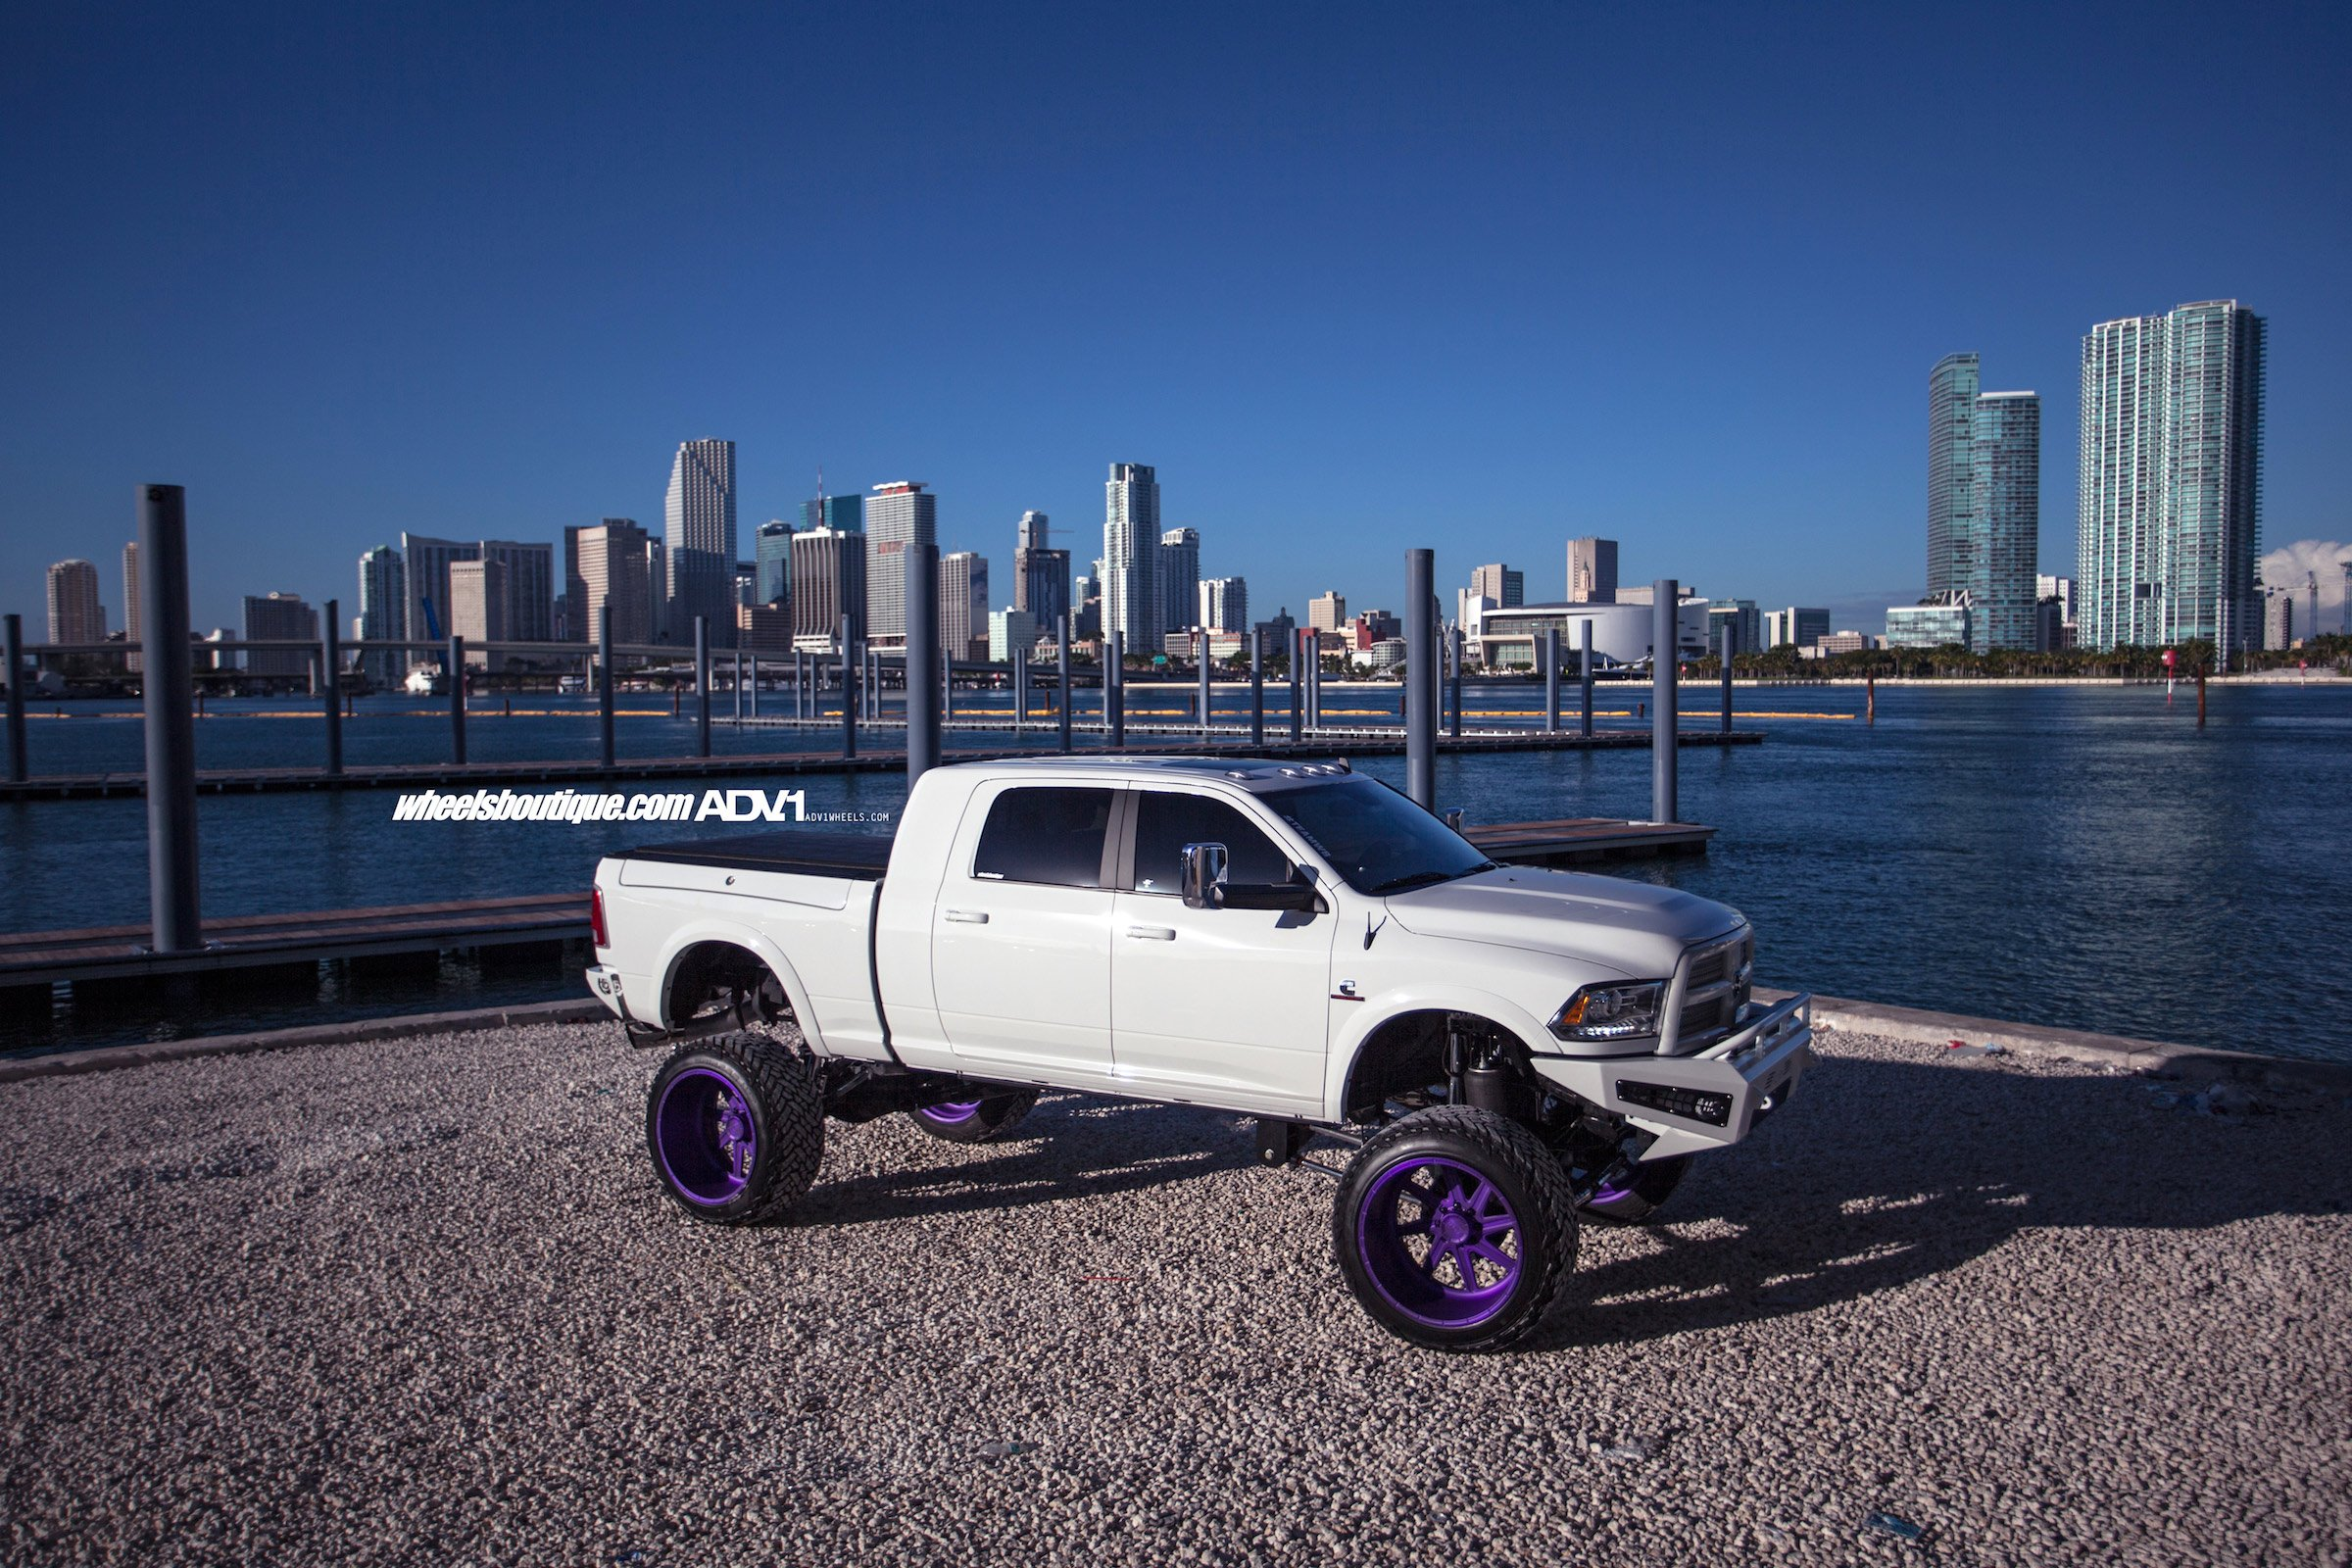 Dodge Ram 2500 White Cars Pickup Truck Adv1 Wheels Wallpaper 2400x1600 819911 Wallpaperup